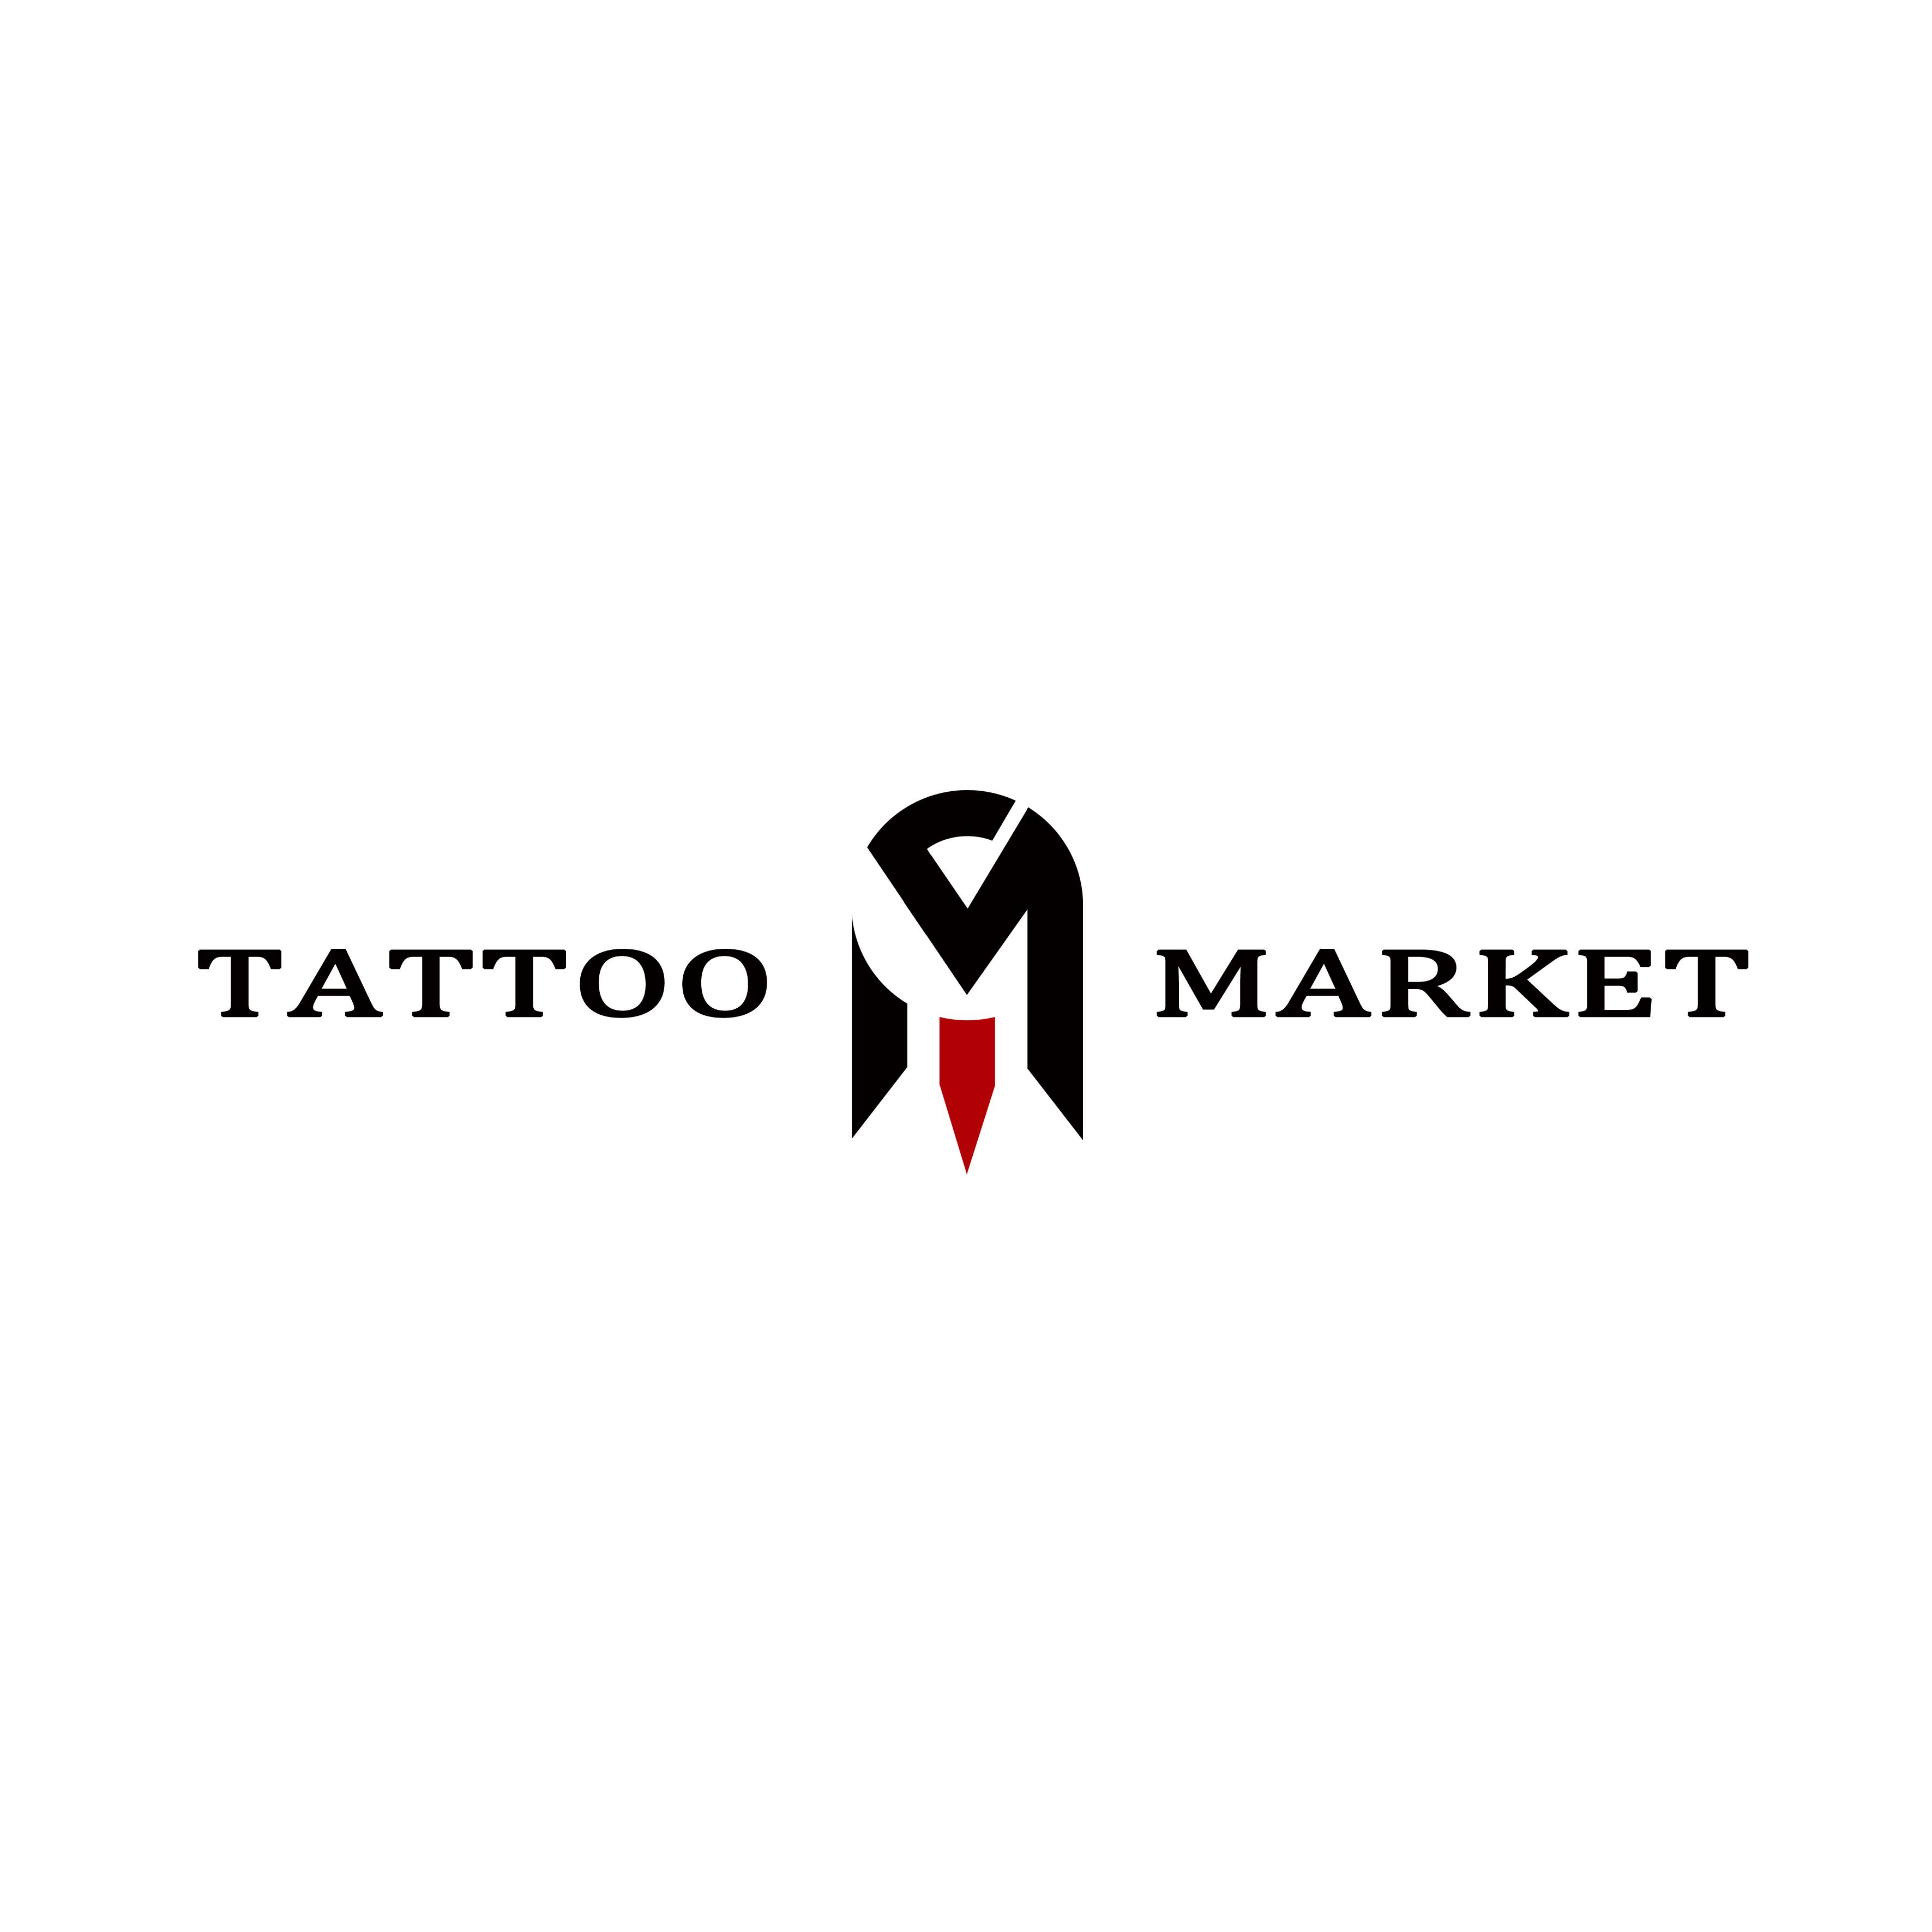 Редизайн логотипа магазина тату оборудования TattooMarket.ru фото f_5675c3dffa1b18a7.jpg